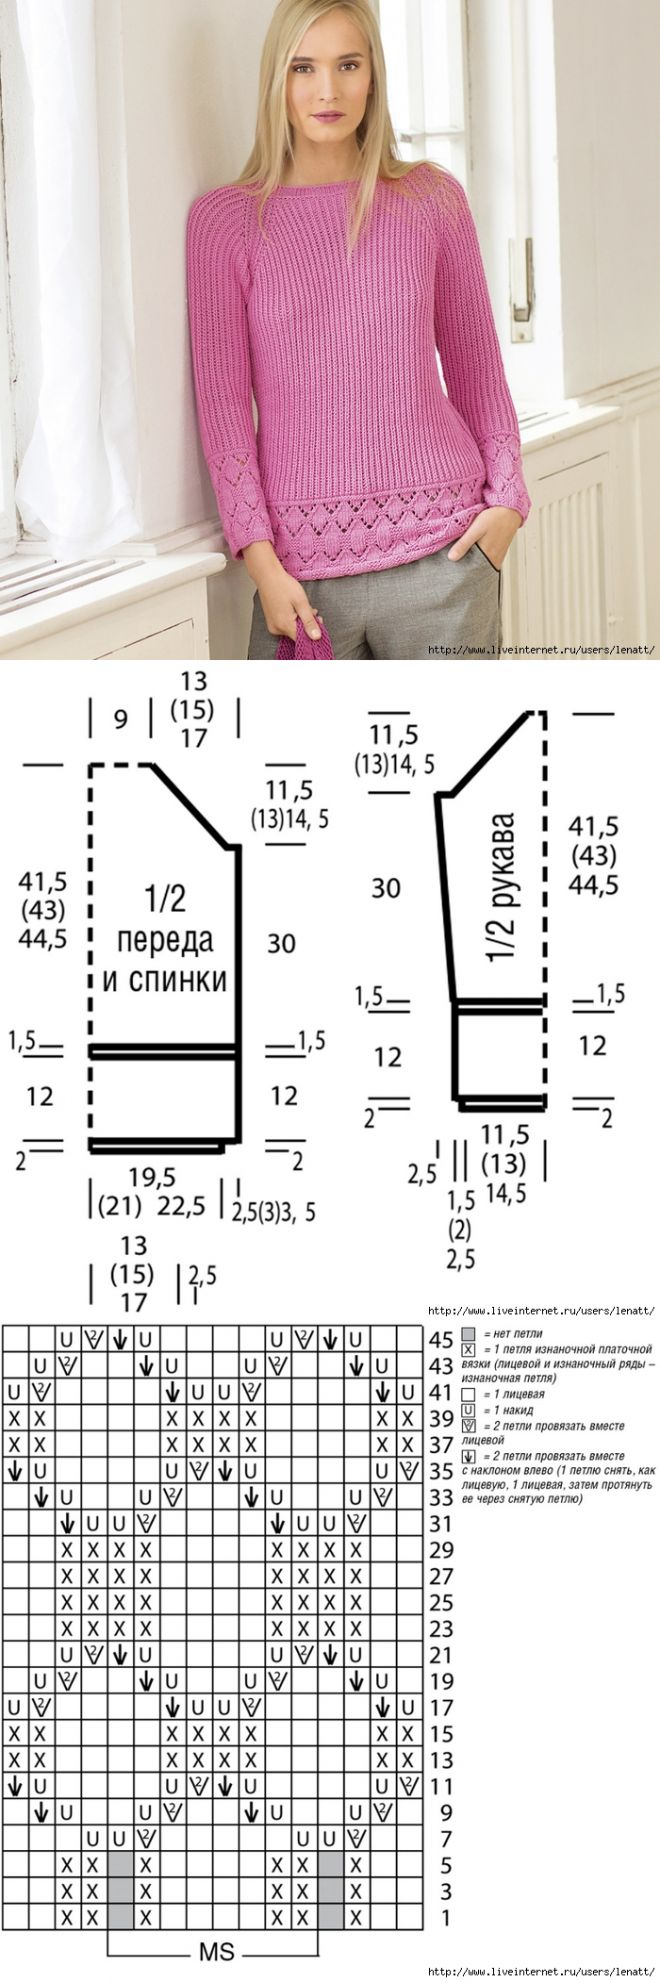 3n-5-2 v-style что за схема